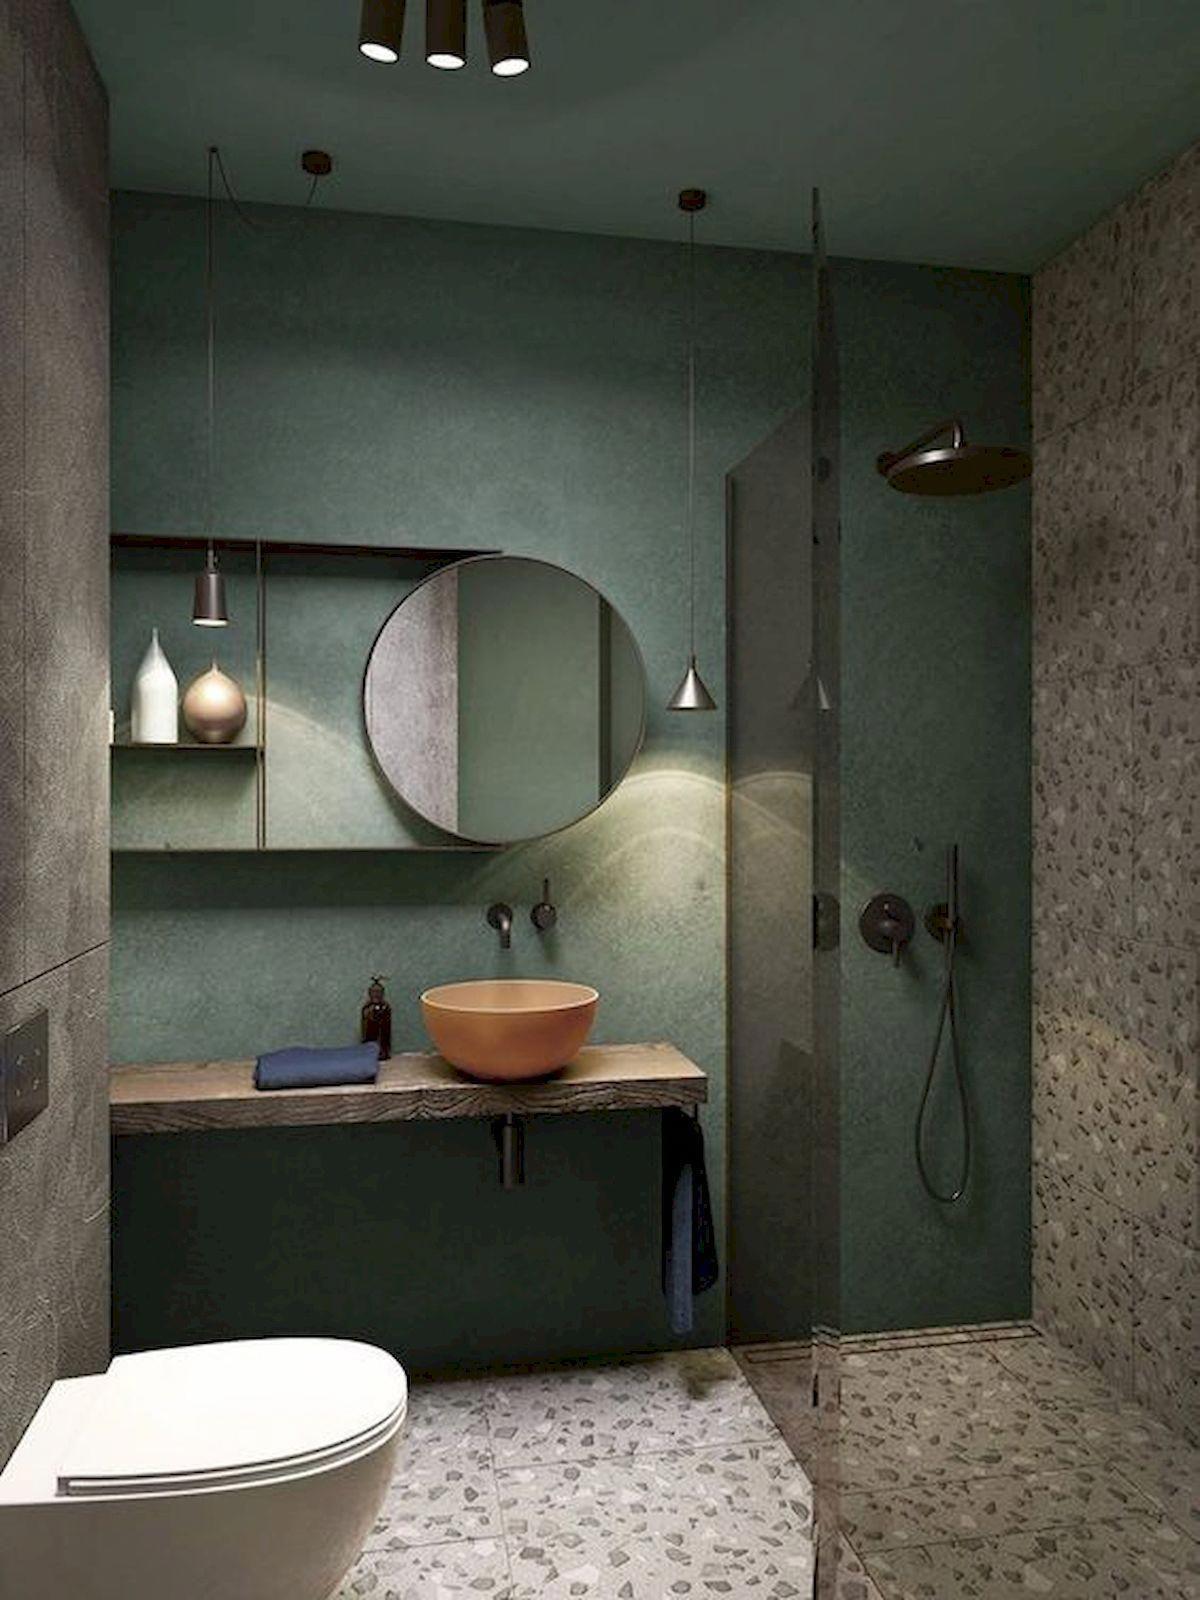 Home Decoration In Pakistan Homedecorationrecycled Product Id 6204407464 Bathroomdesigninp Bathroom Design Inspiration Natural Bathroom Bathroom Design Small